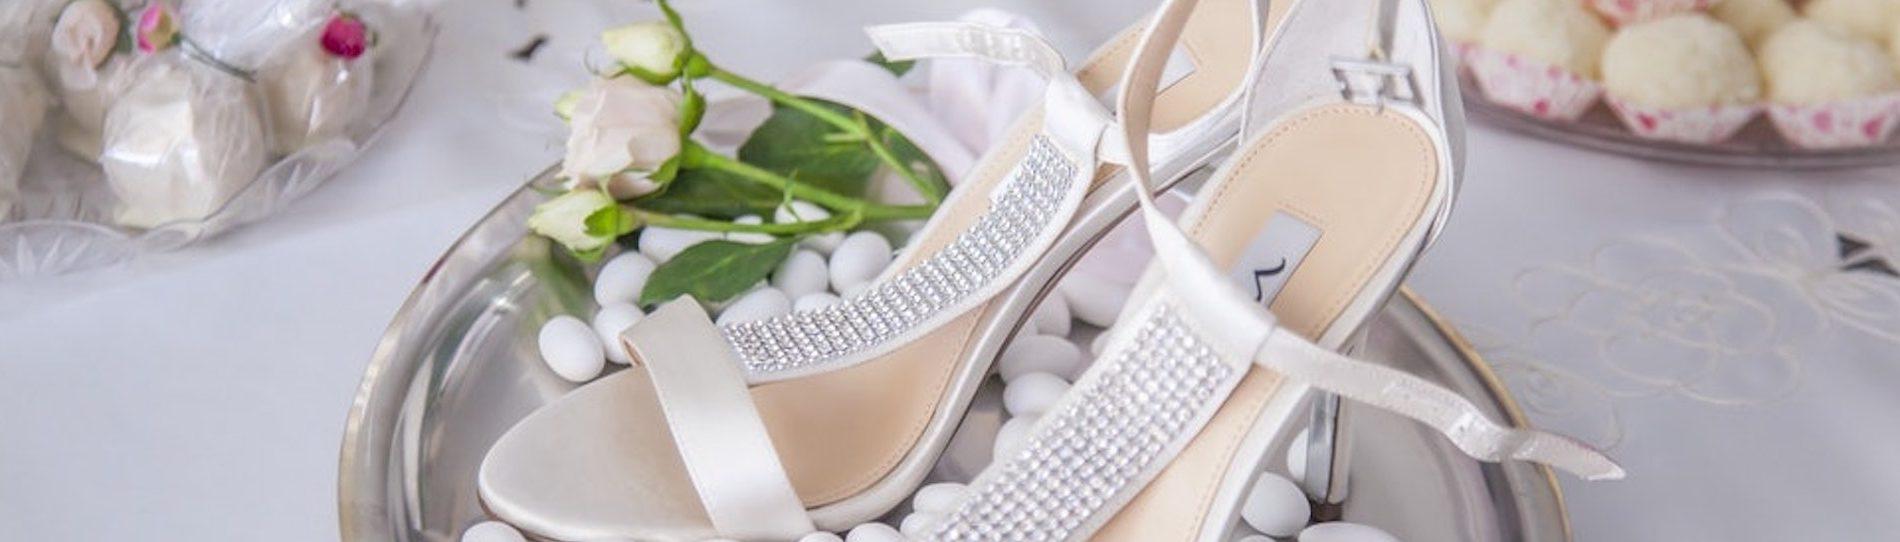 wedding planning companies sydney